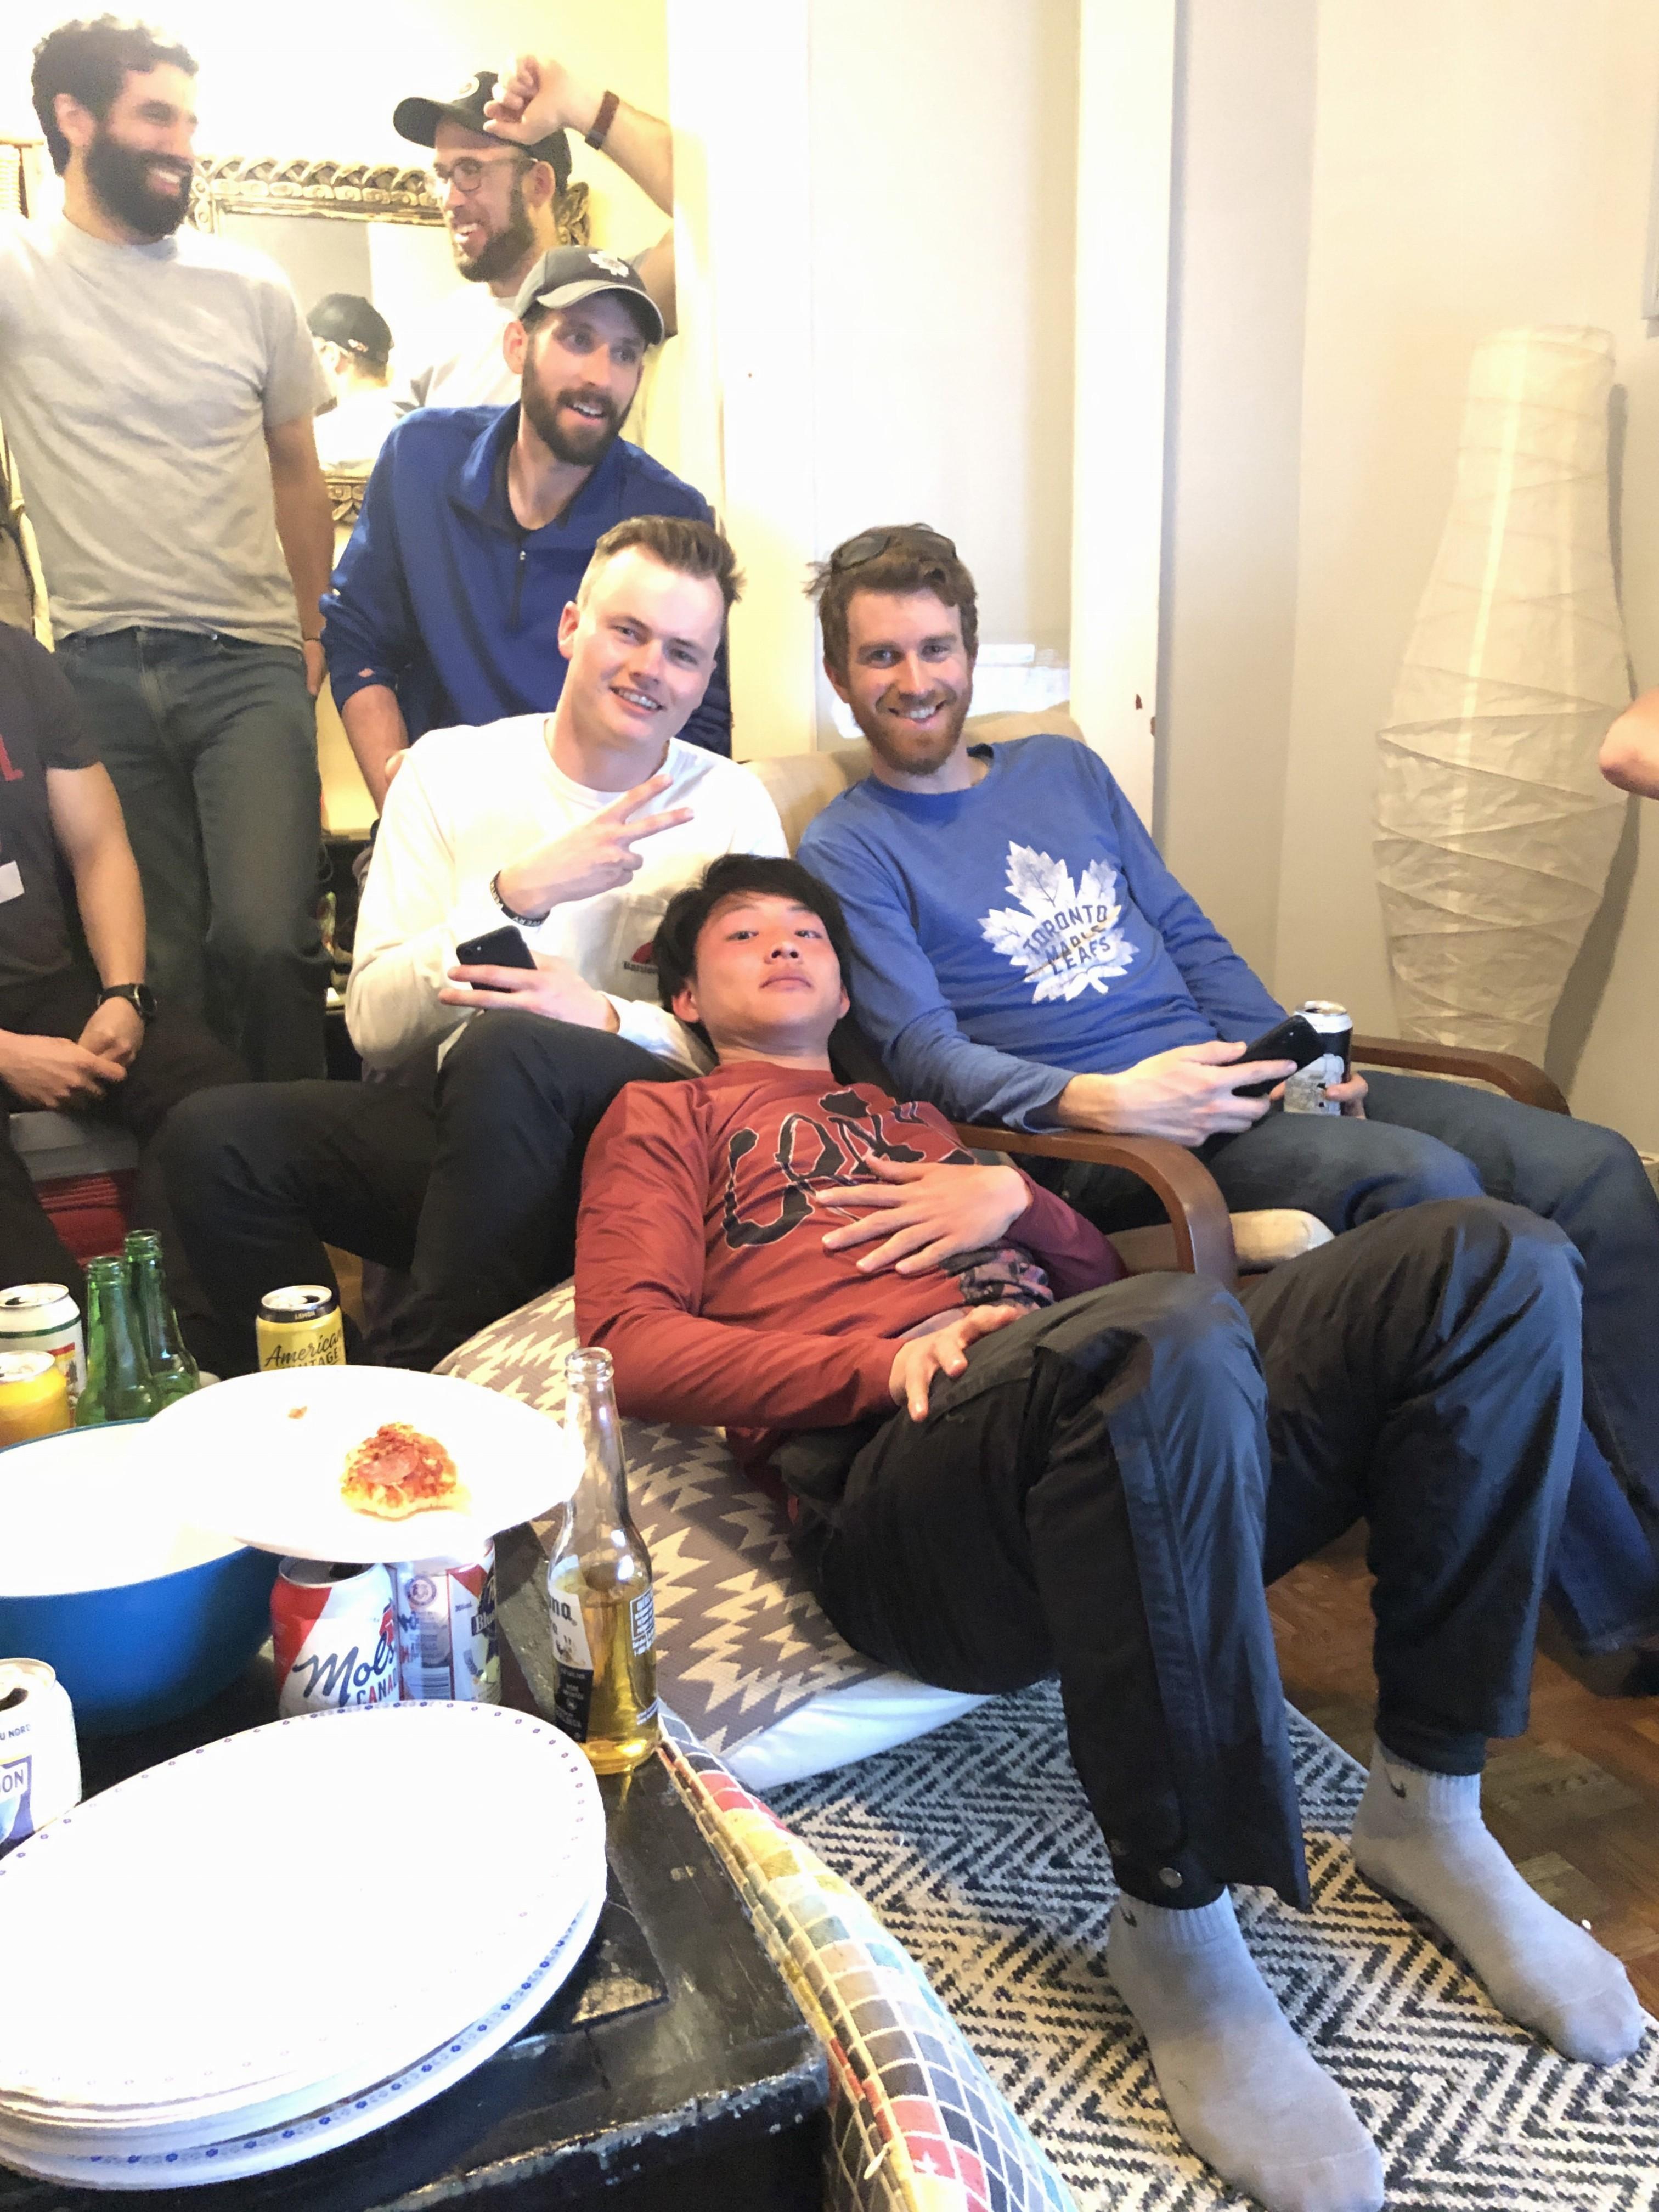 Toronto Rush のホームパーティの様子